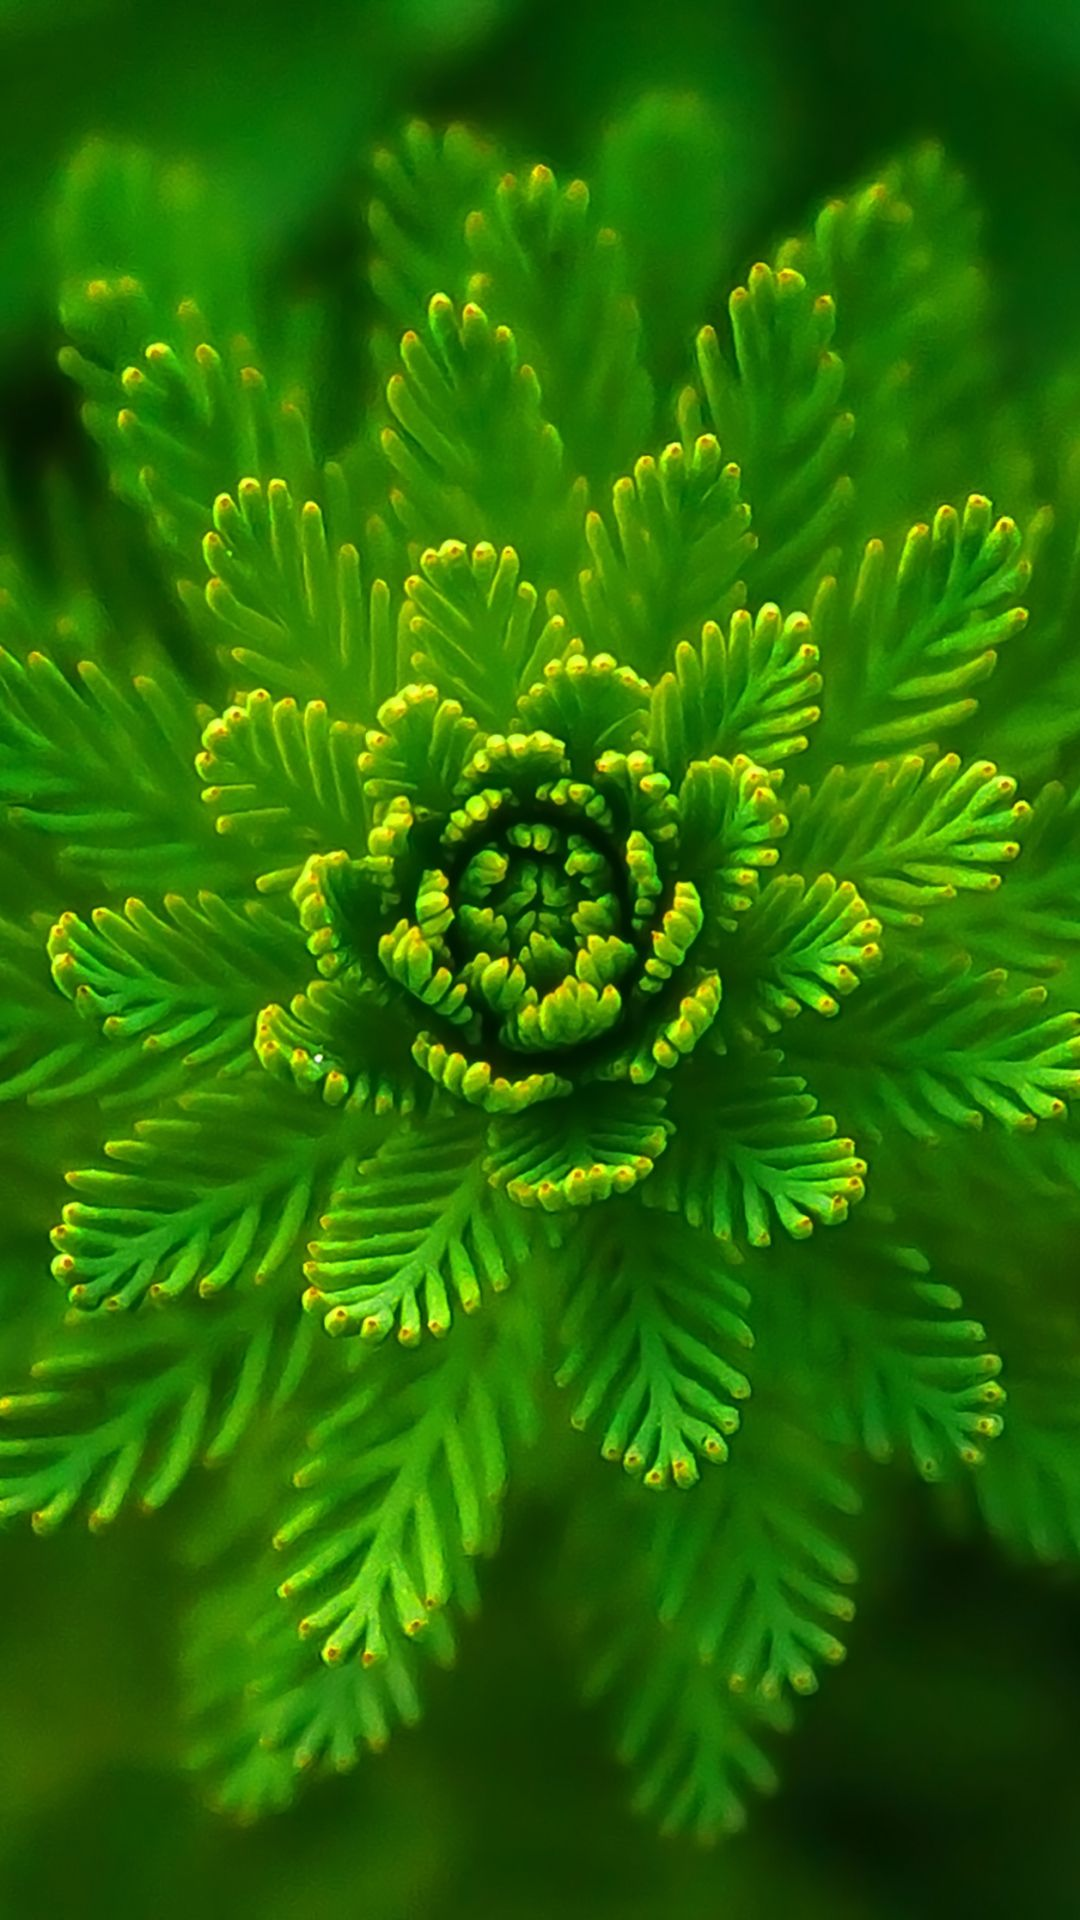 Hd wallpaper vivo - Algae Plant Macro Close Up Iphone 6 Wallpaper